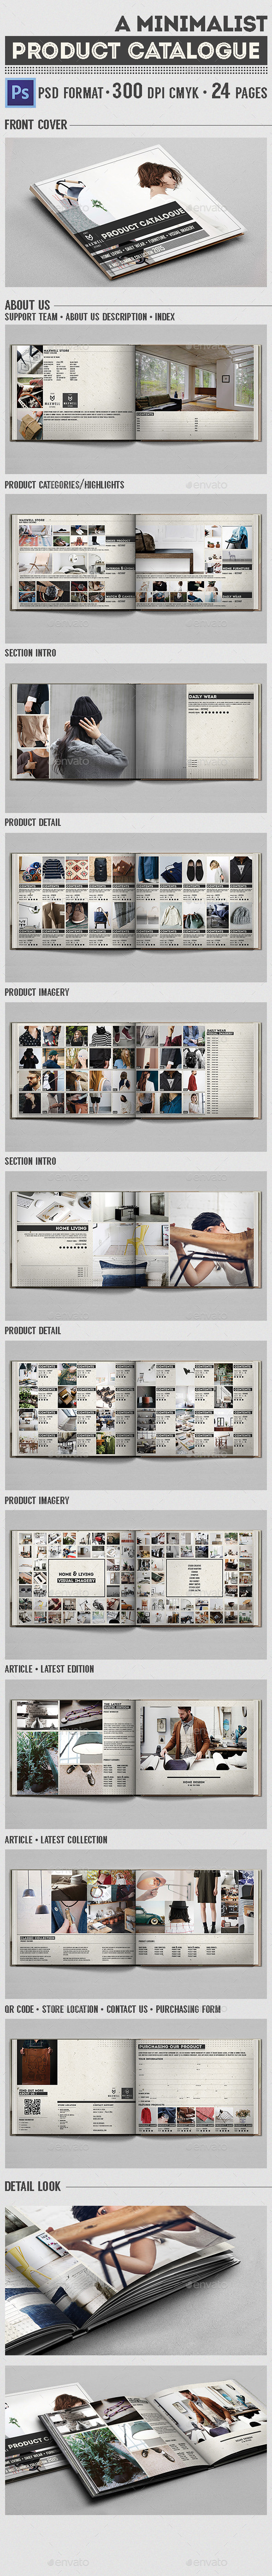 Minimalist Product Catalog - Catalogs Brochures